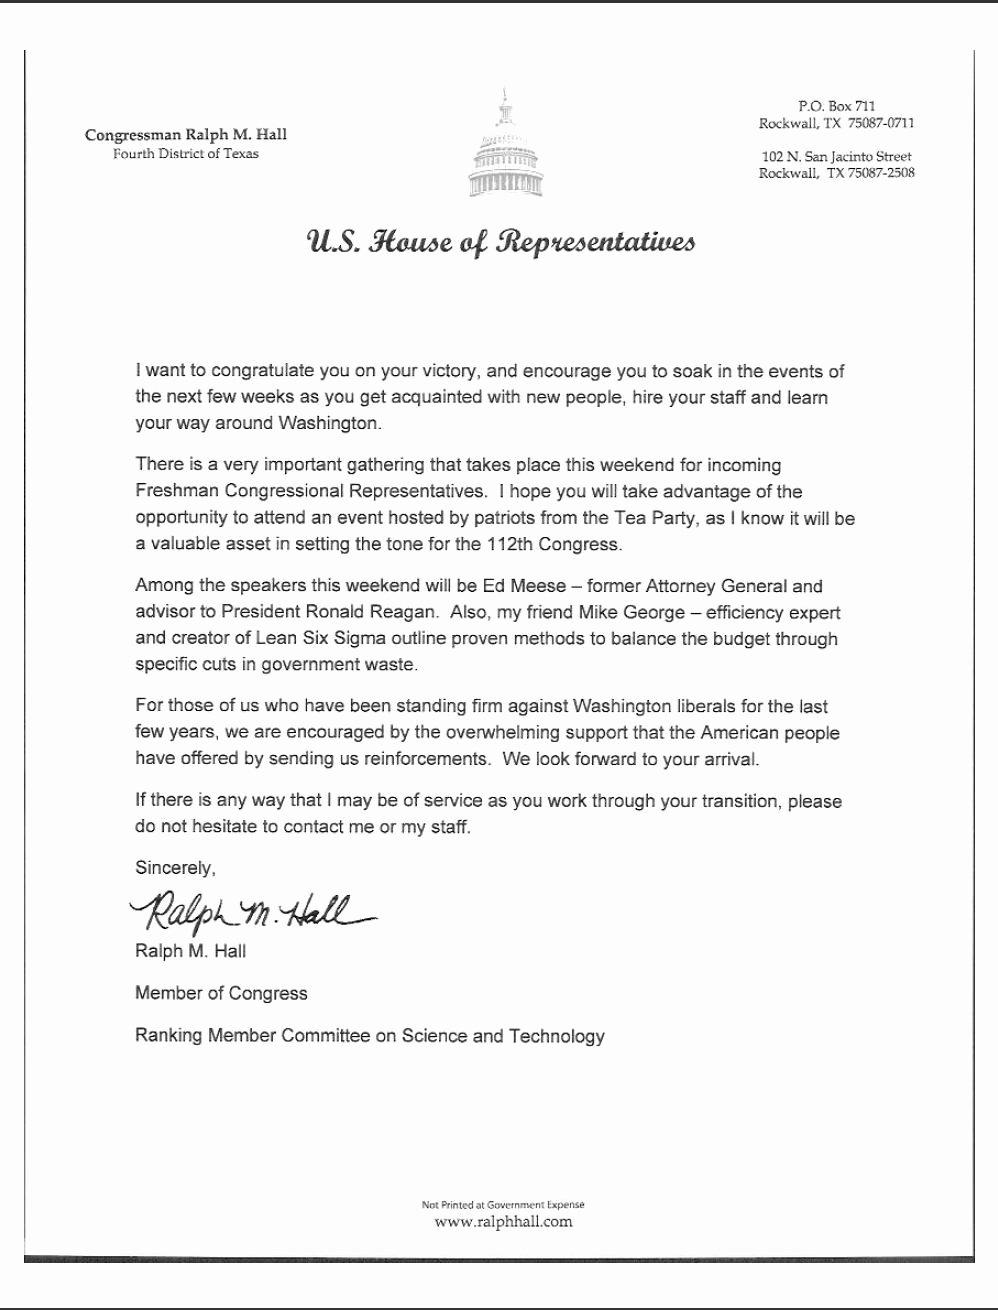 Letter to Representative format Unique Letter to Congressman Template Samples